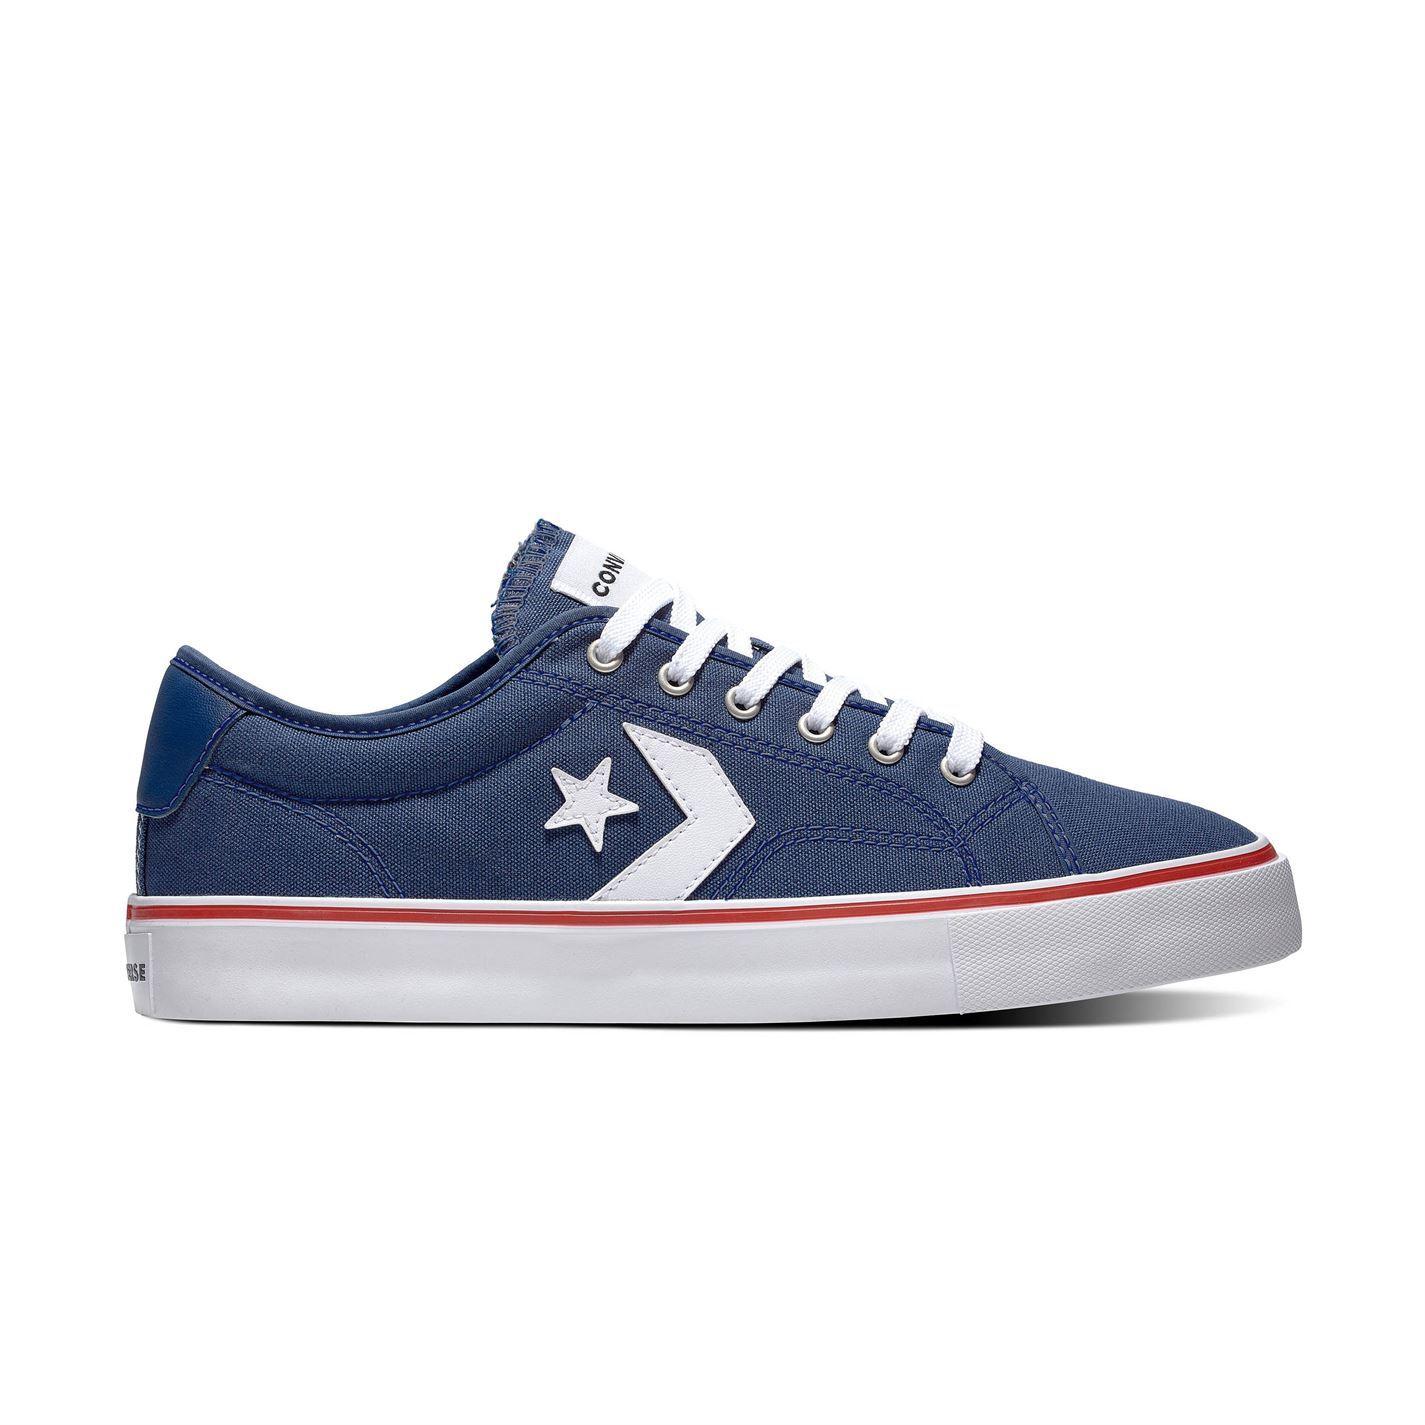 Converse-Ox-REPLAY-Baskets-Pour-Homme-Chaussures-De-Loisirs-Chaussures-Baskets miniature 15